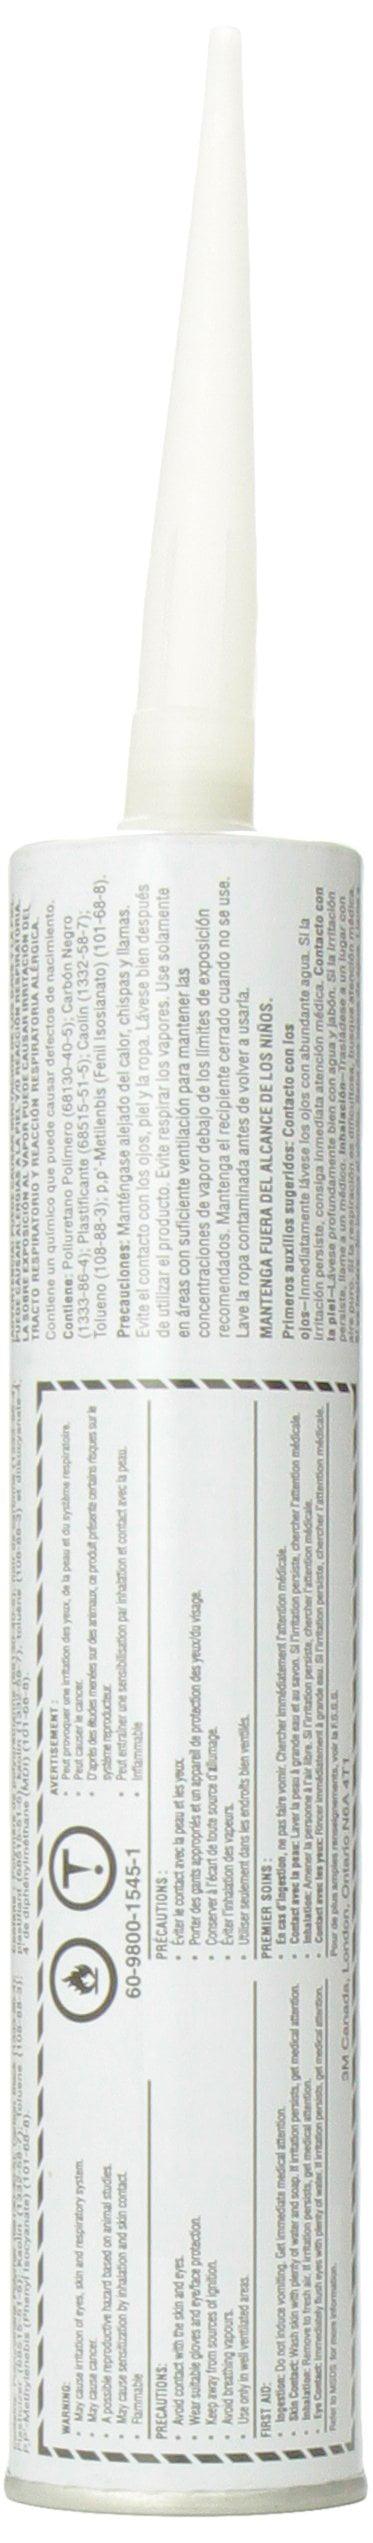 3m 3M-8693 Auto Glass Urethane Windshield Adhesive 08693, 10.5 Fl Oz Cartridge by 3M